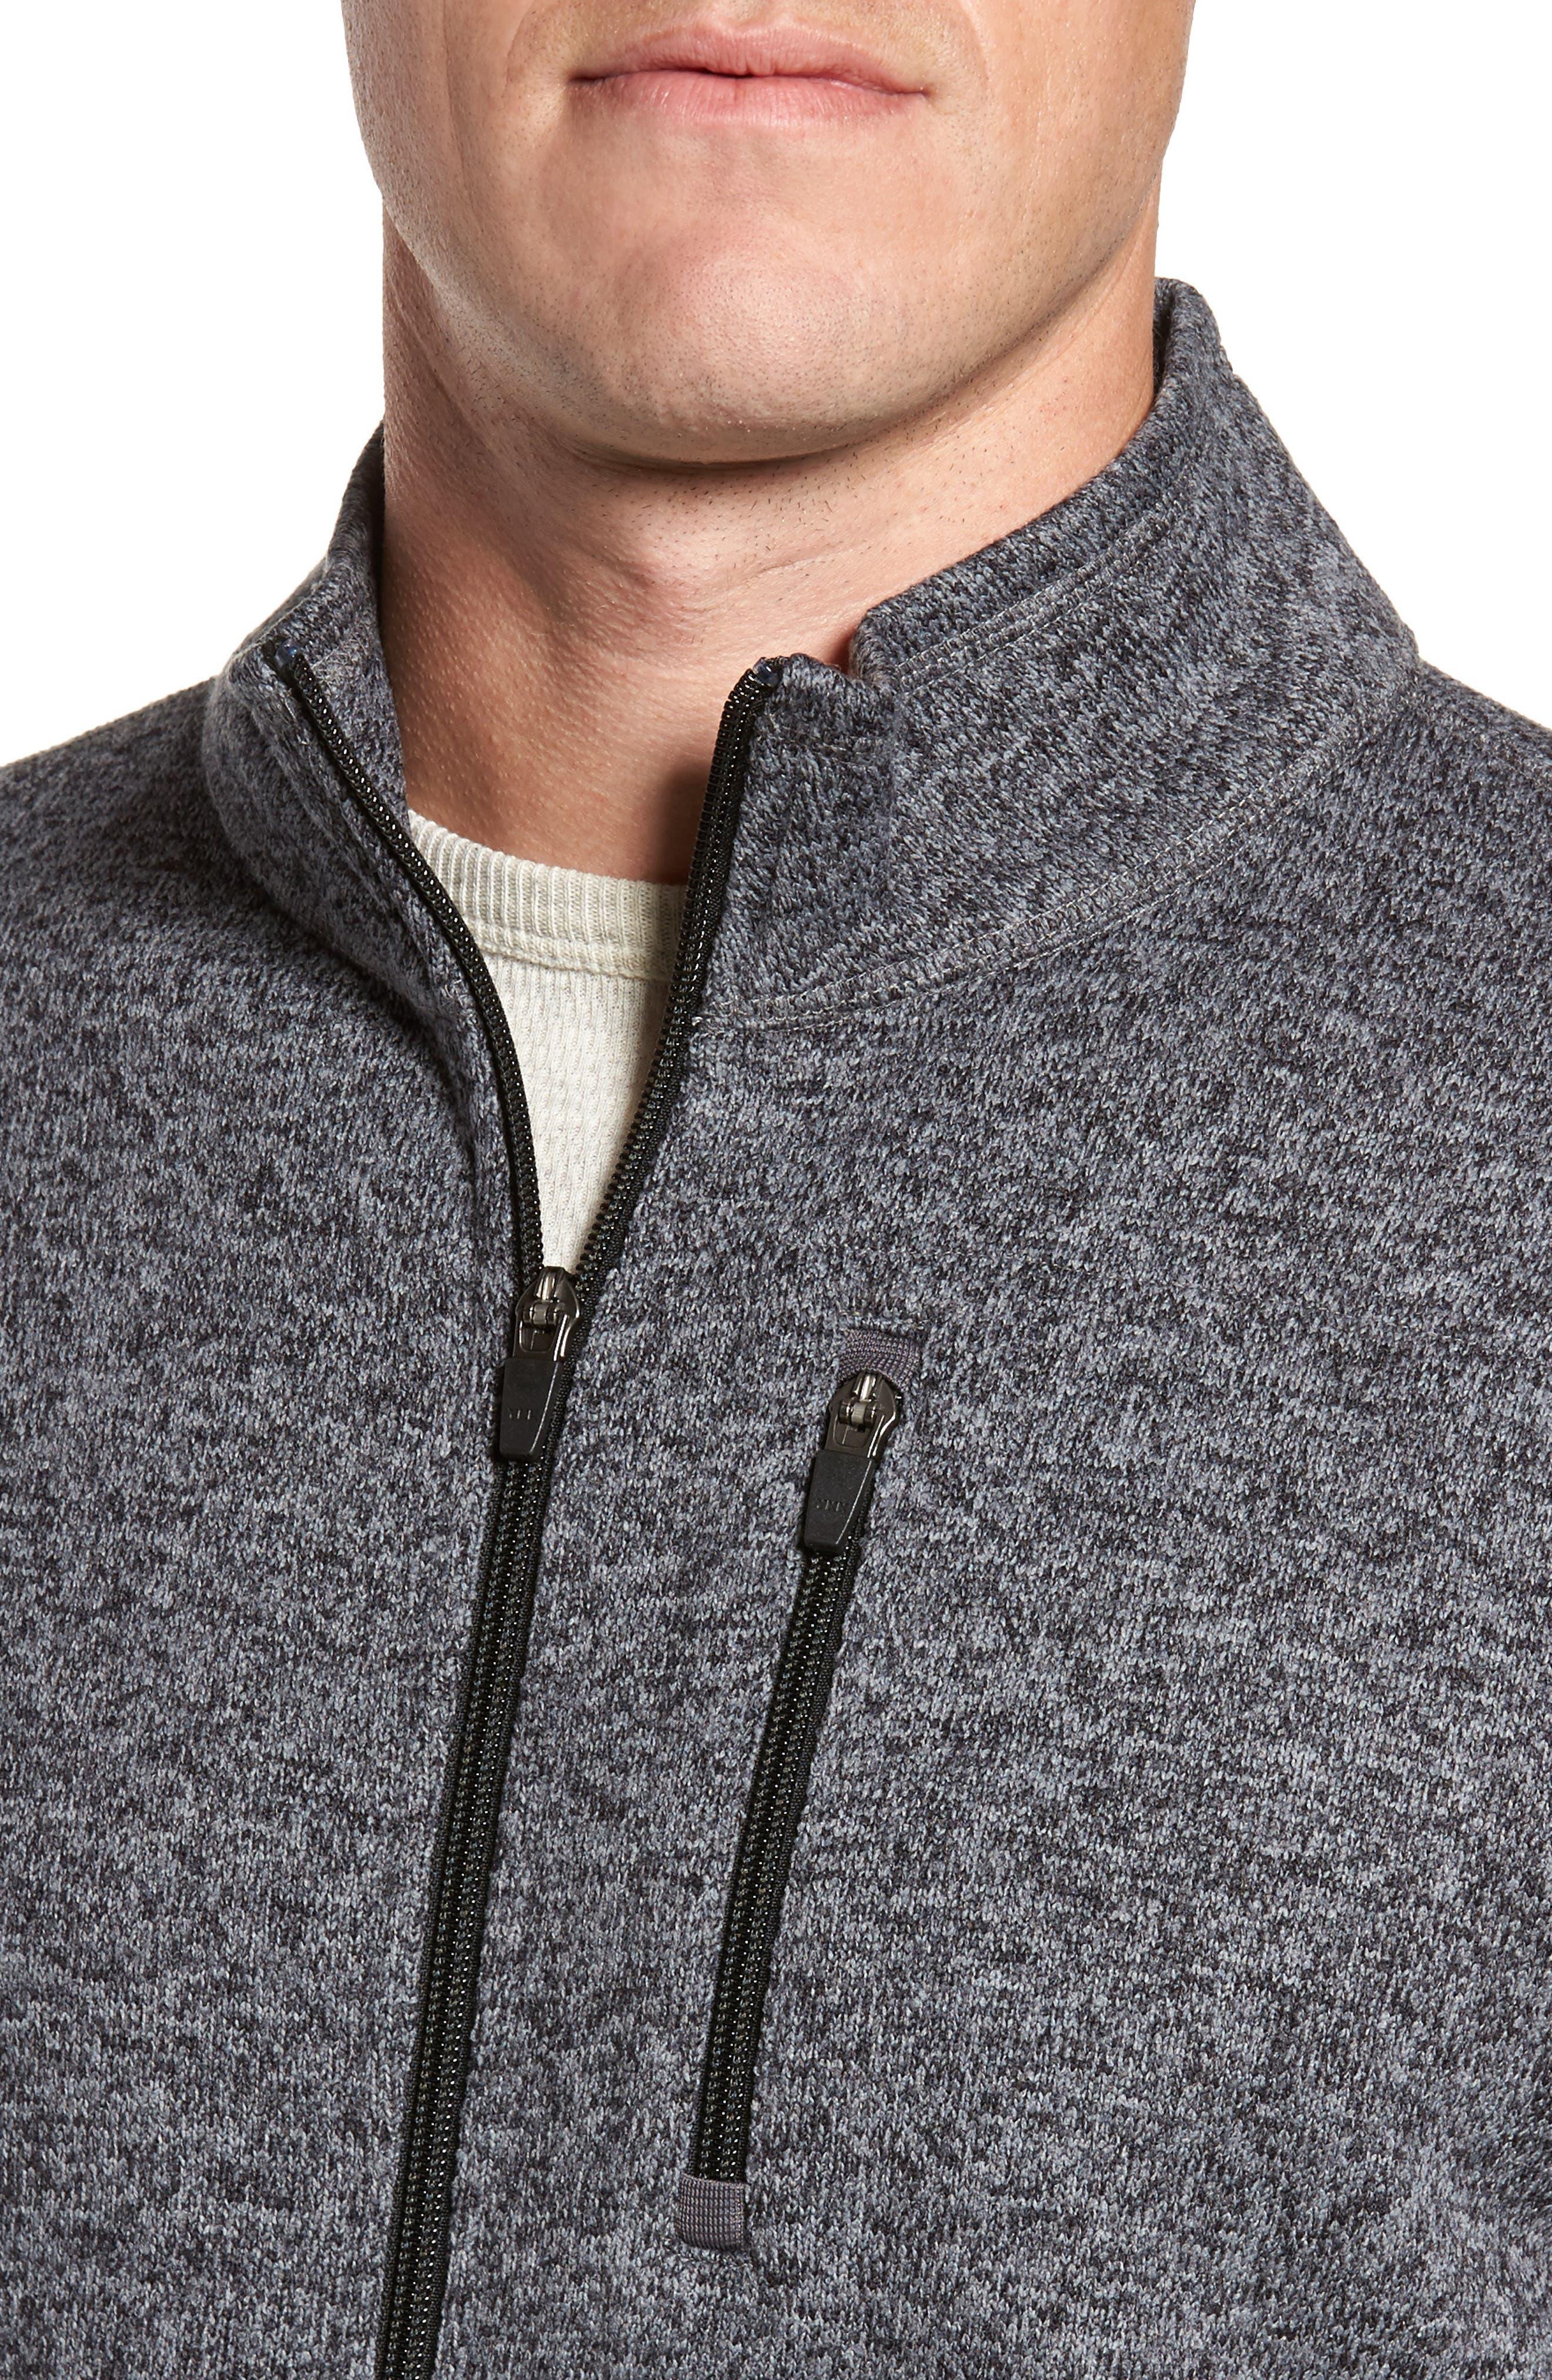 Sweater Knit Fleece Zip Front Jacket,                             Alternate thumbnail 10, color,